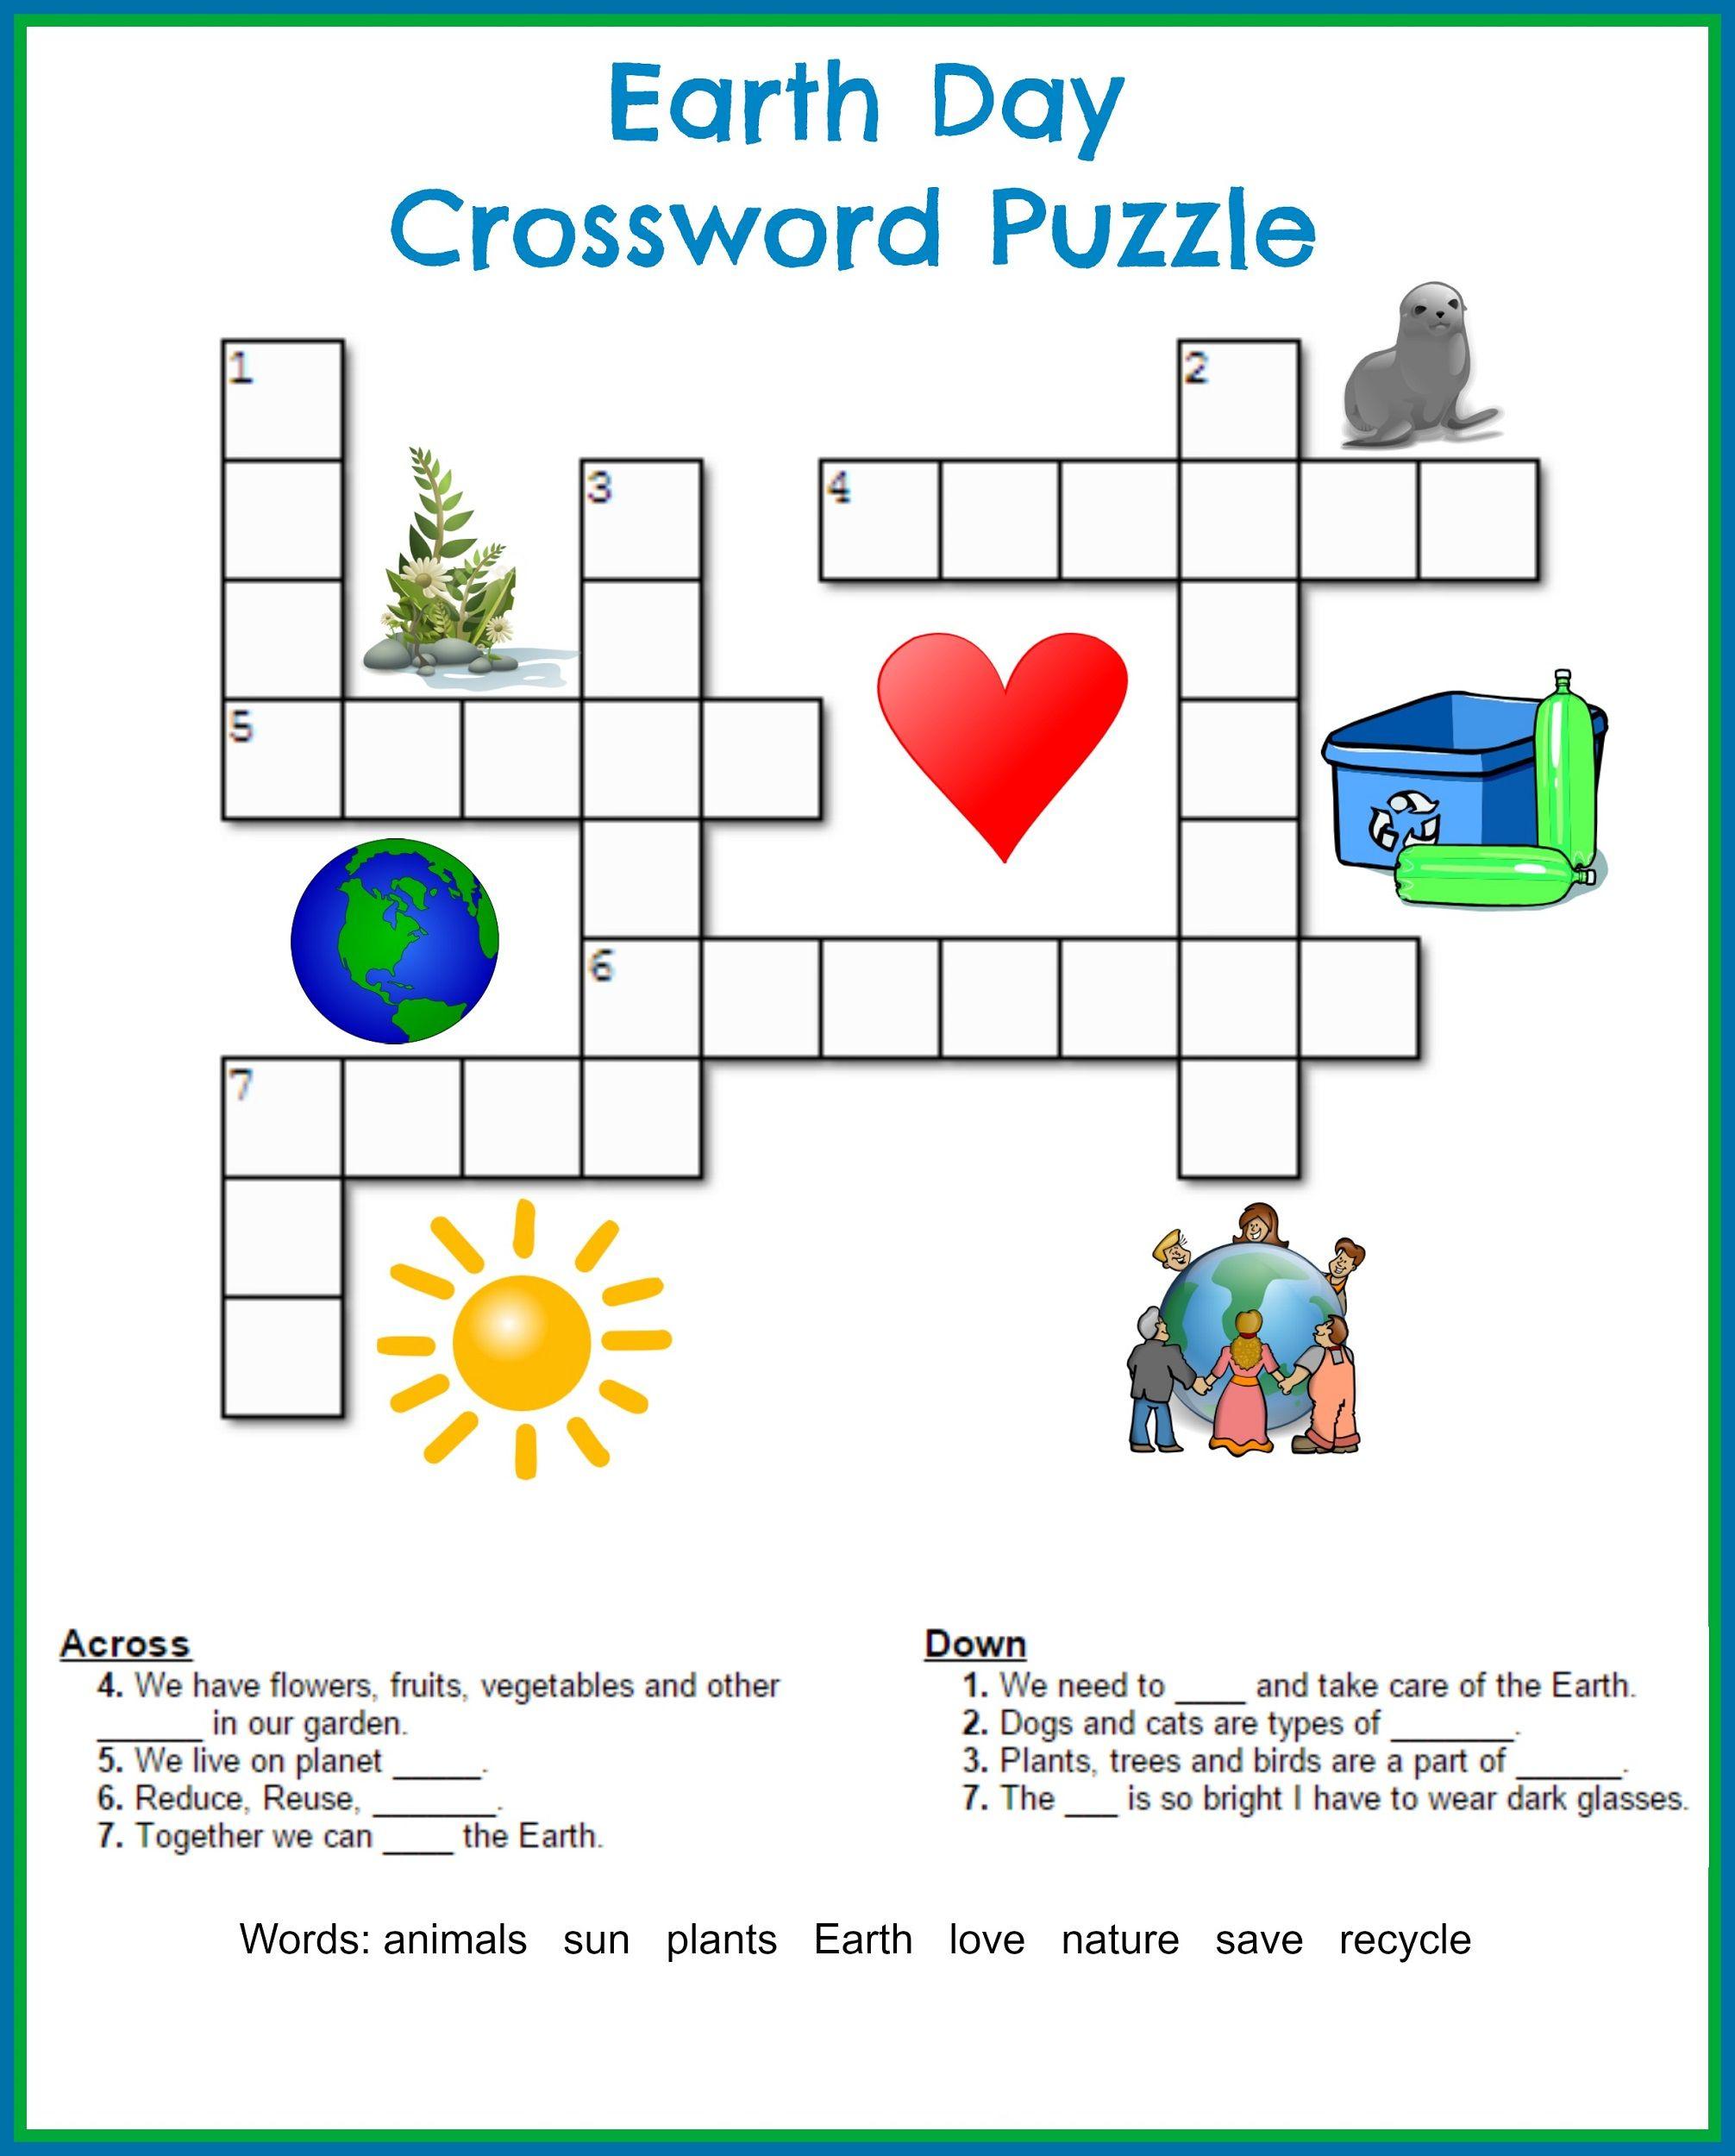 Printable Crossword Puzzles Kids | Crossword Puzzles On Earth - Printable Crossword Puzzle For Kindergarten